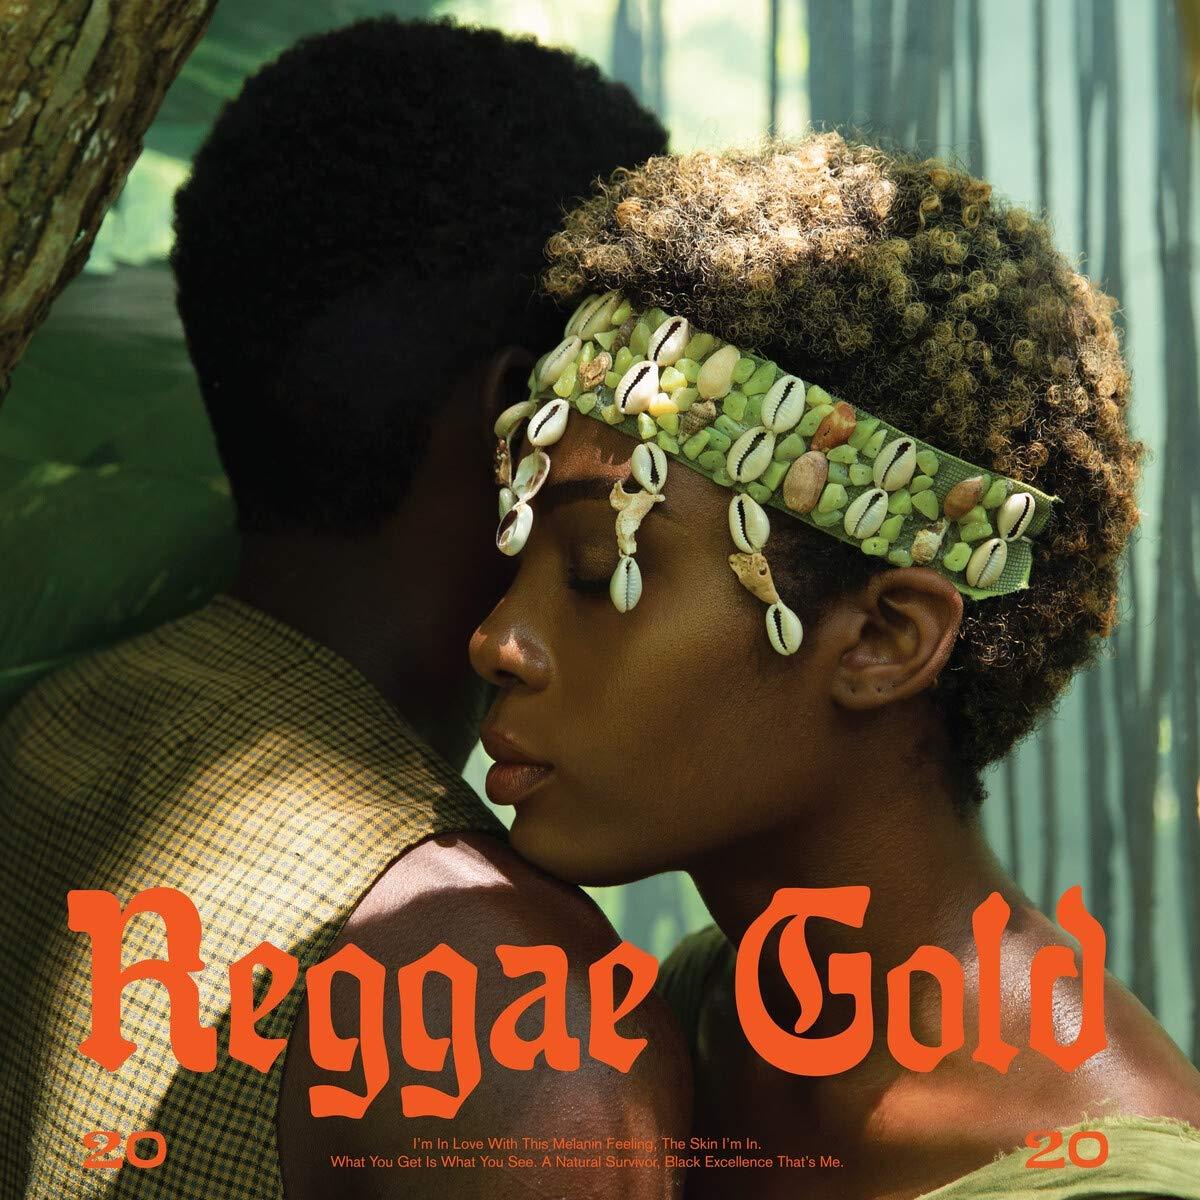 VA – Reggae Gold 2020 (2020) [FLAC]